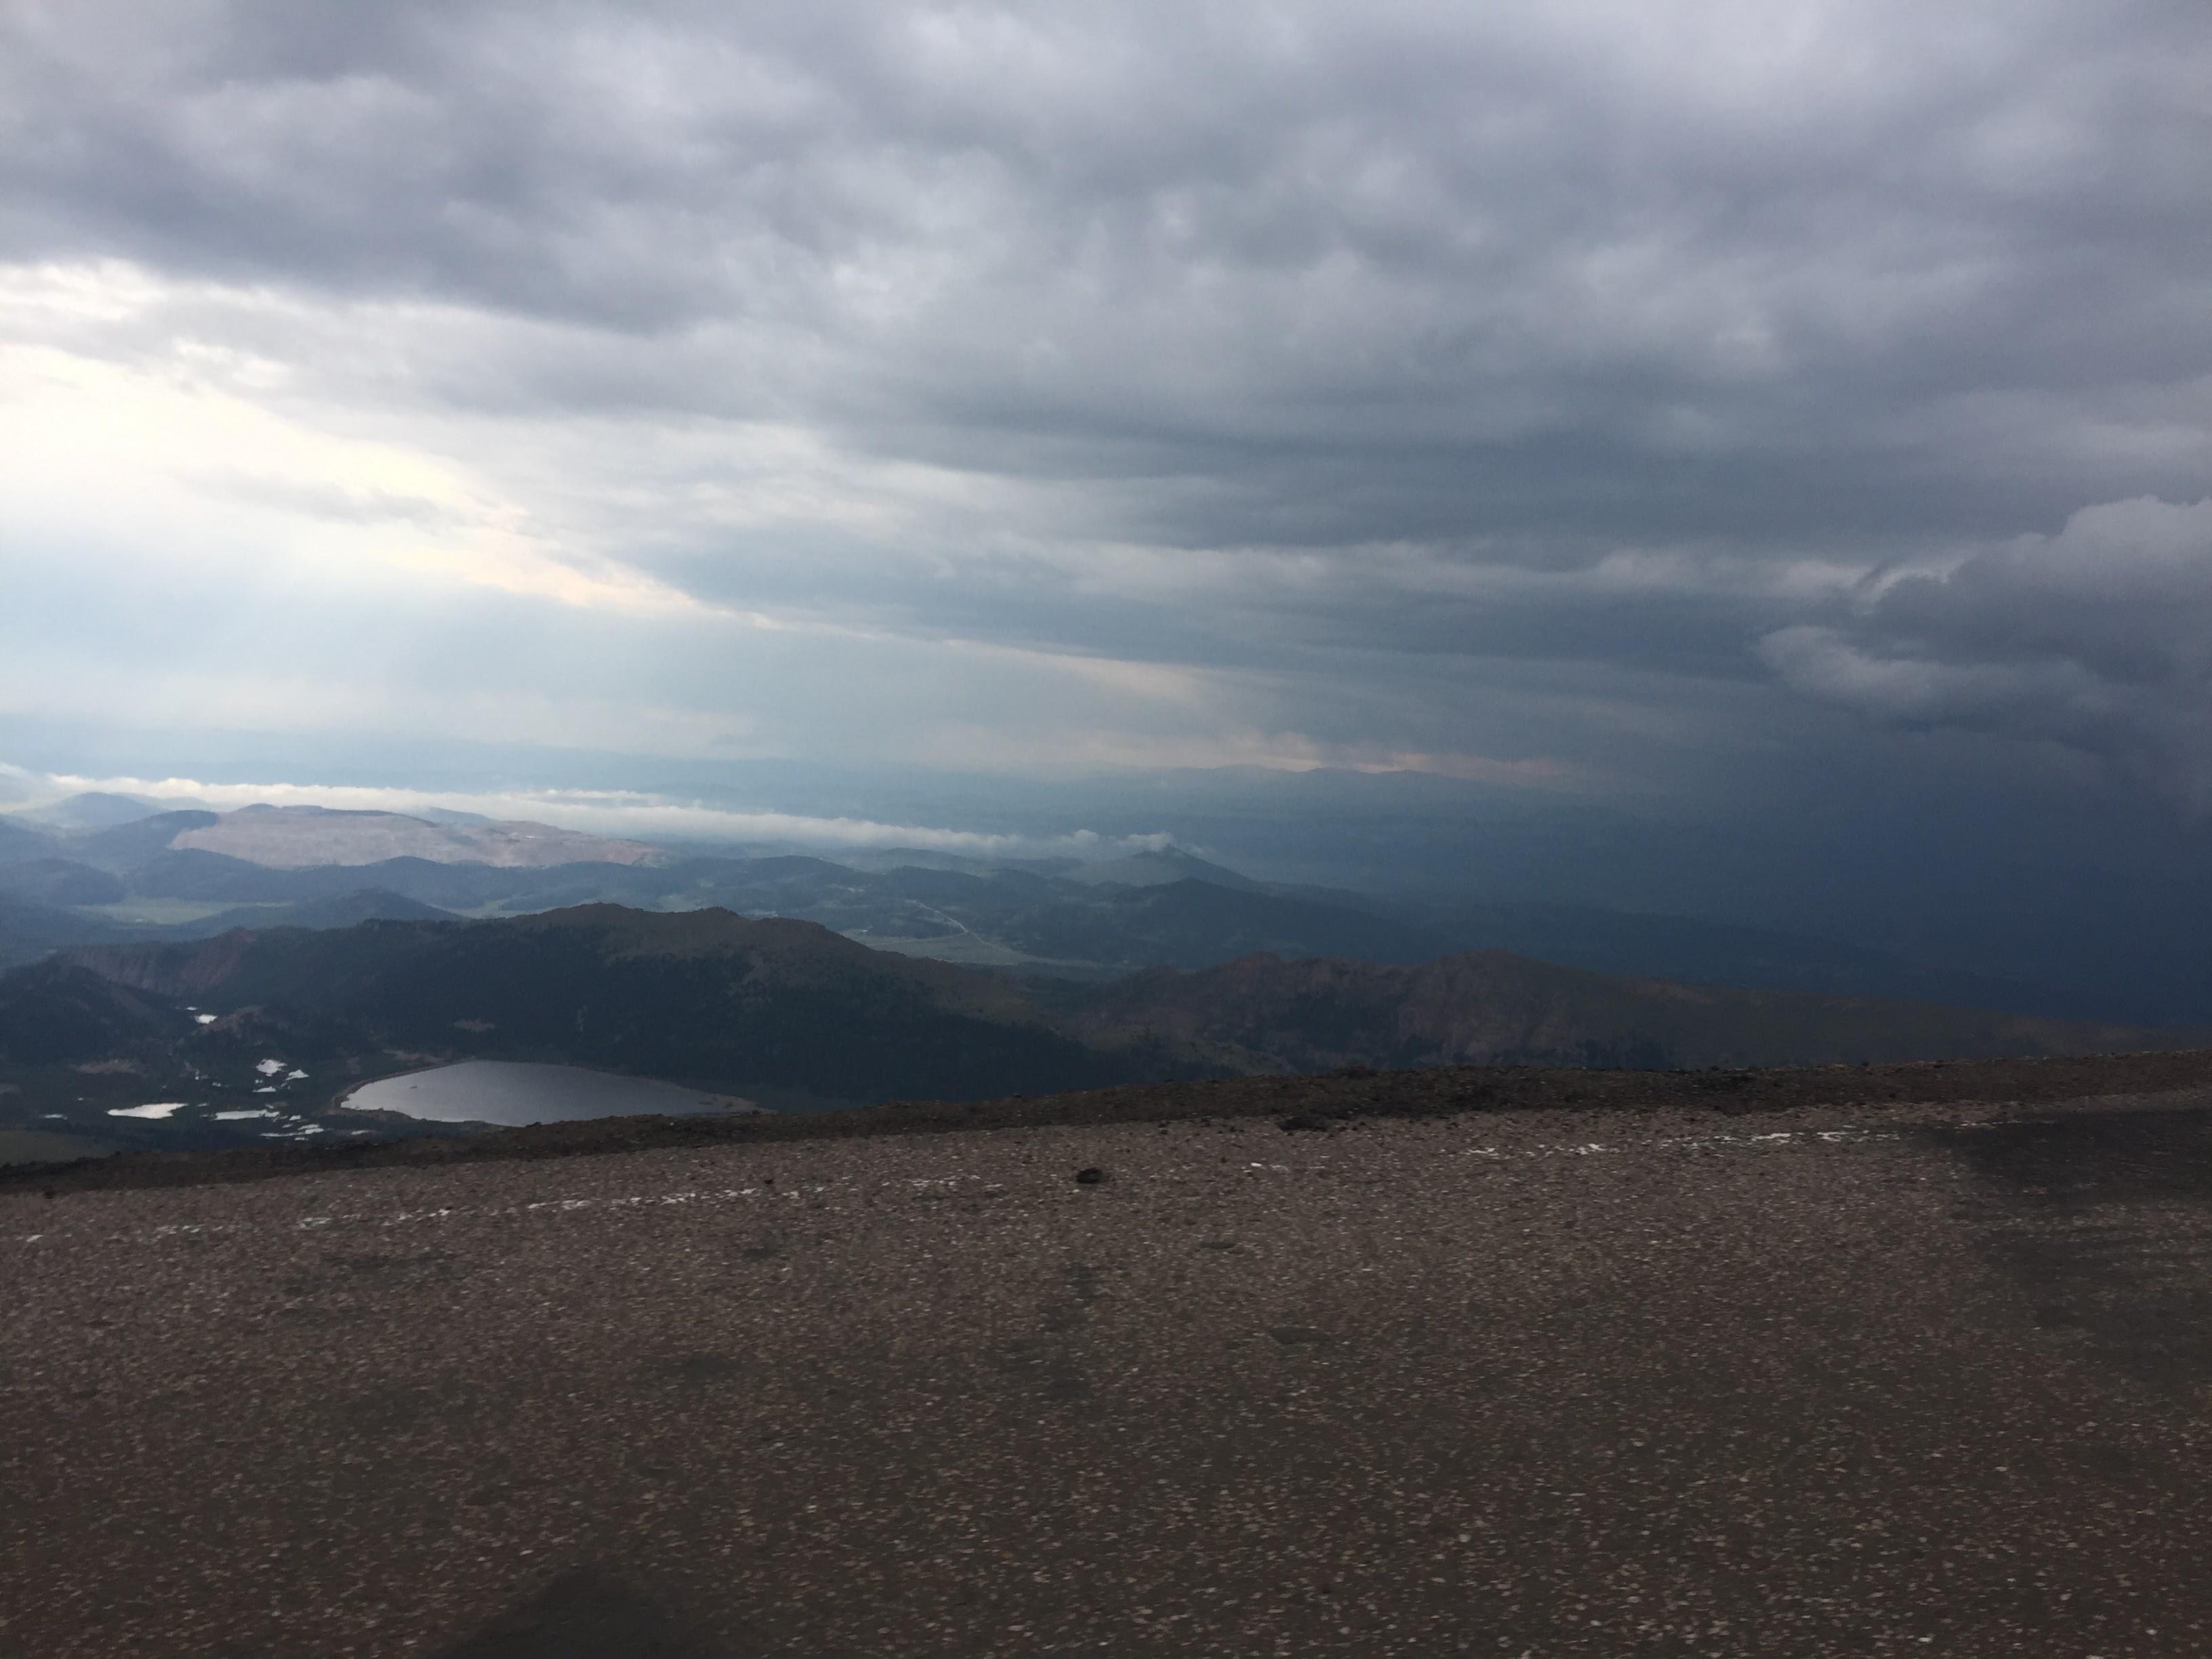 Pike's Peak, Colorado, 2017